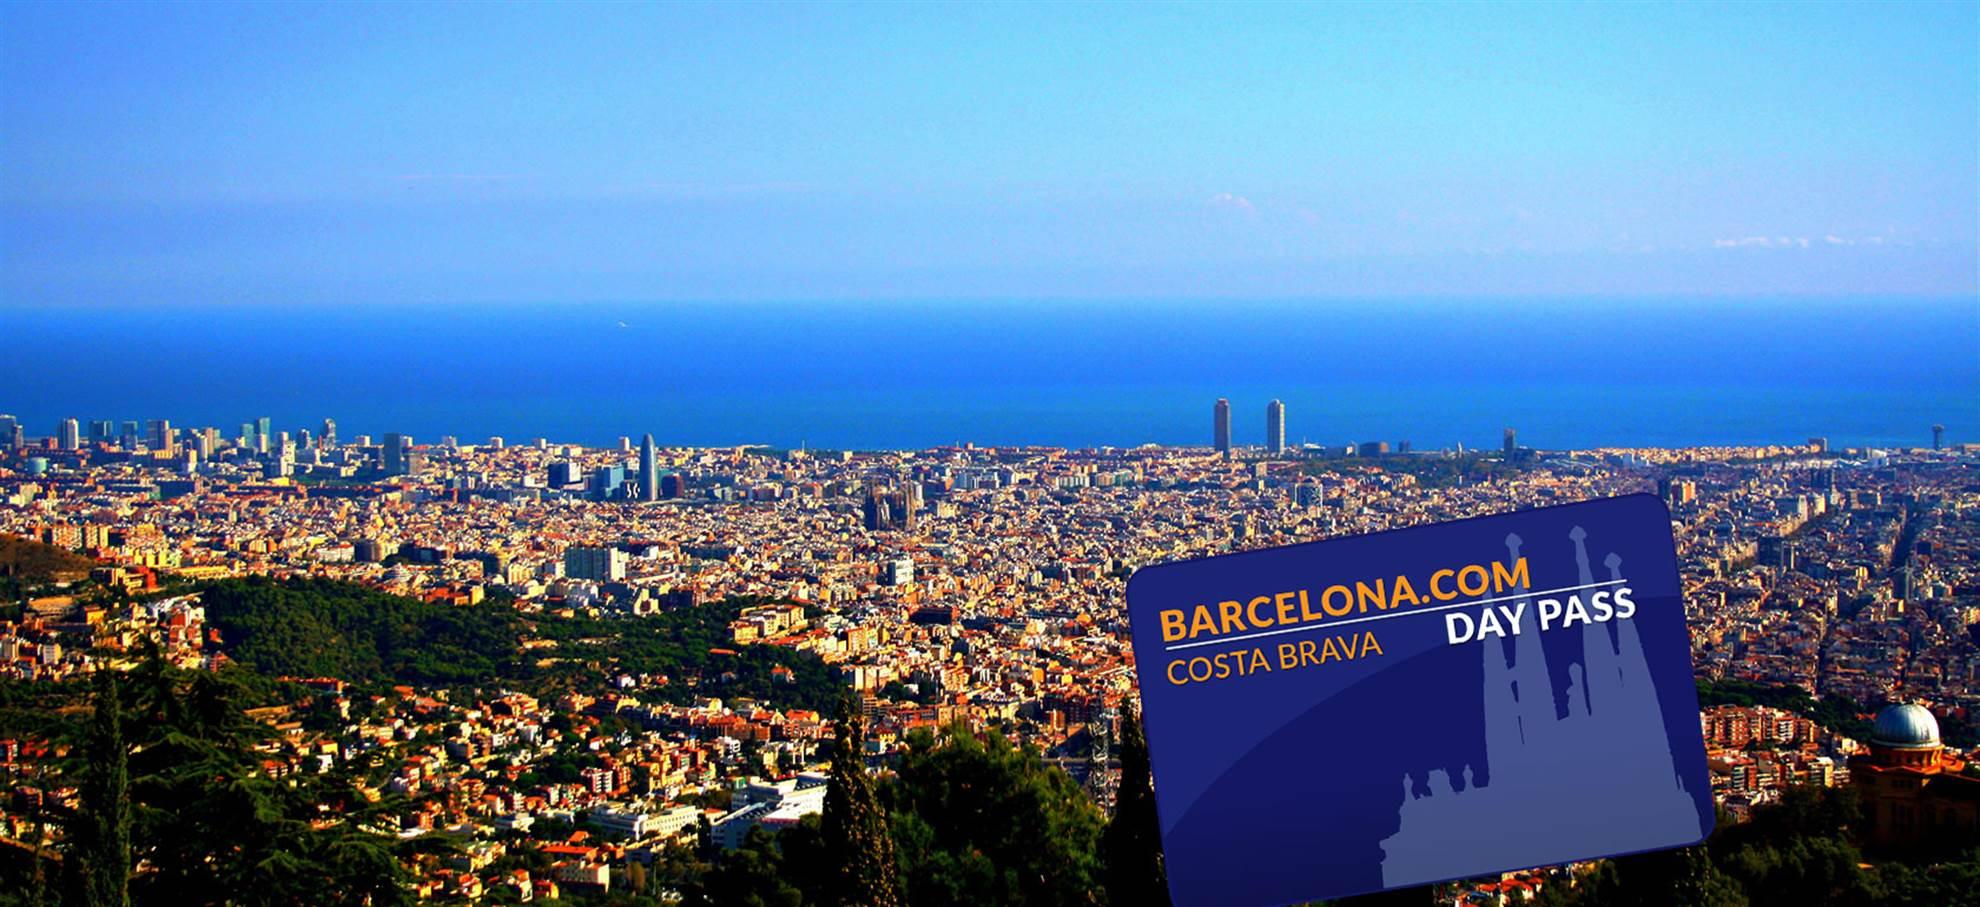 Pass Giornaliero Costa Brava – Barcelona.com